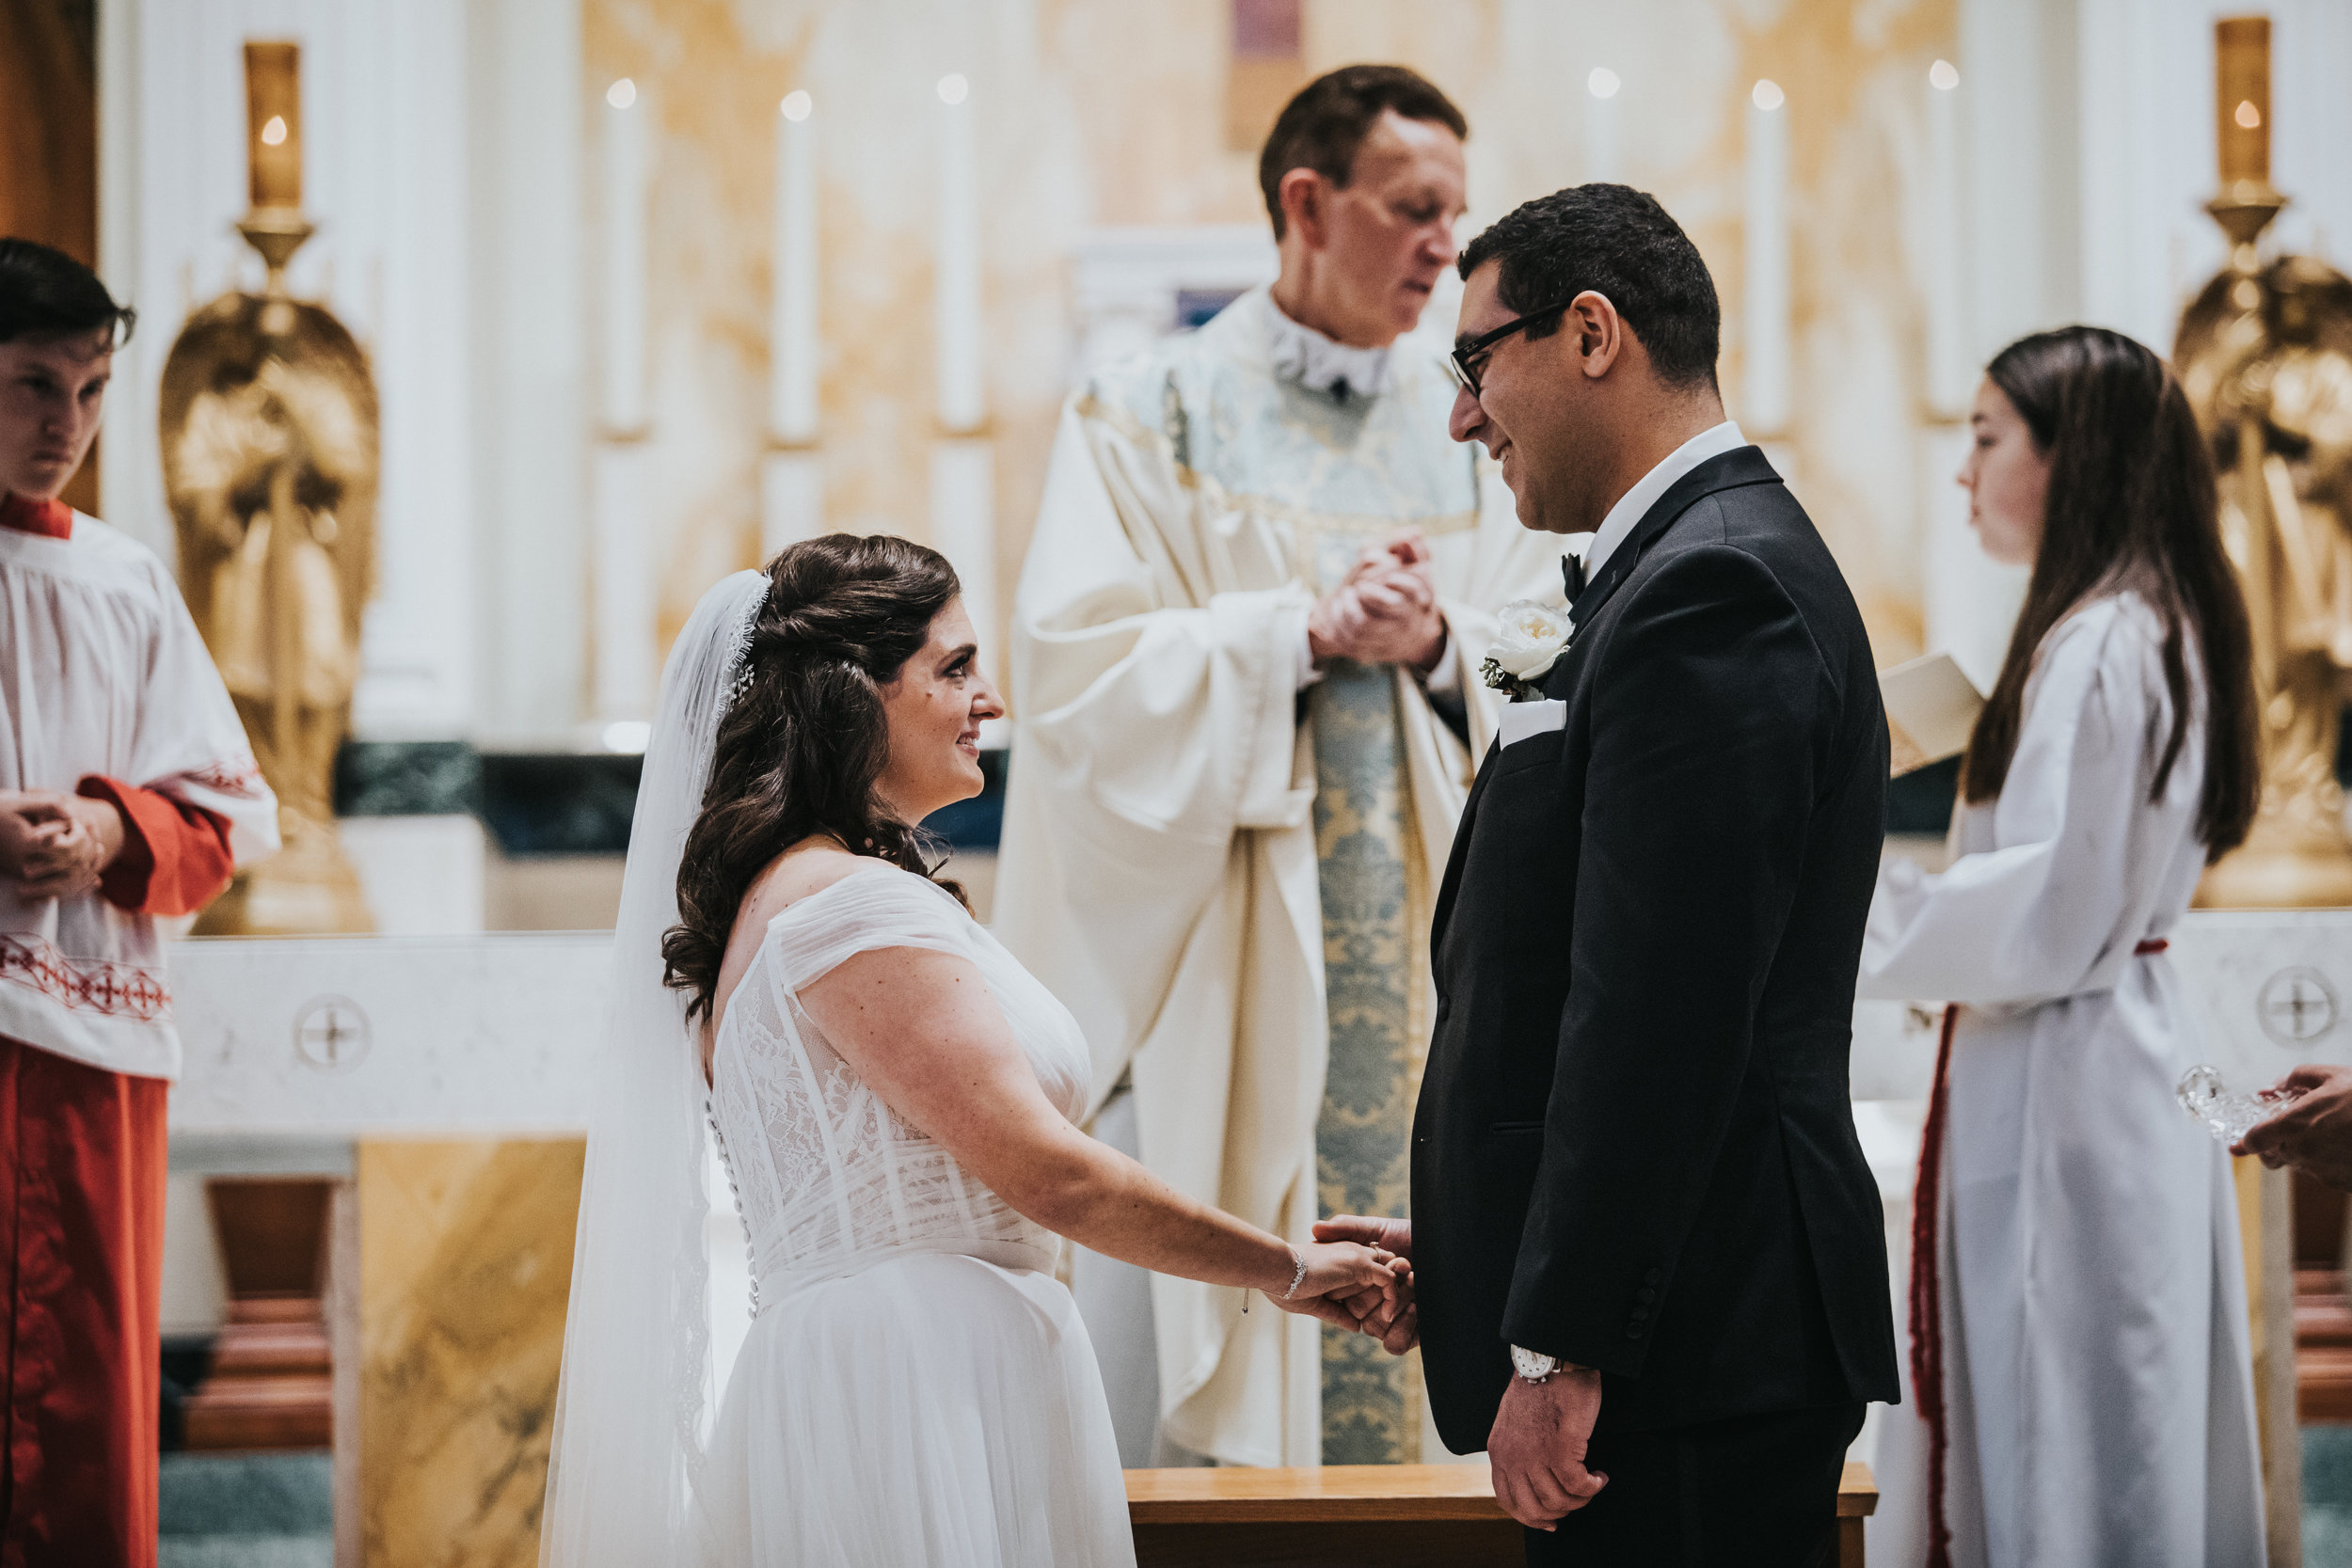 JennaLynnPhotography-NJWeddingPhotographer-Philadelphia-Wedding-ArtsBallroom-Ceremony-53.jpg